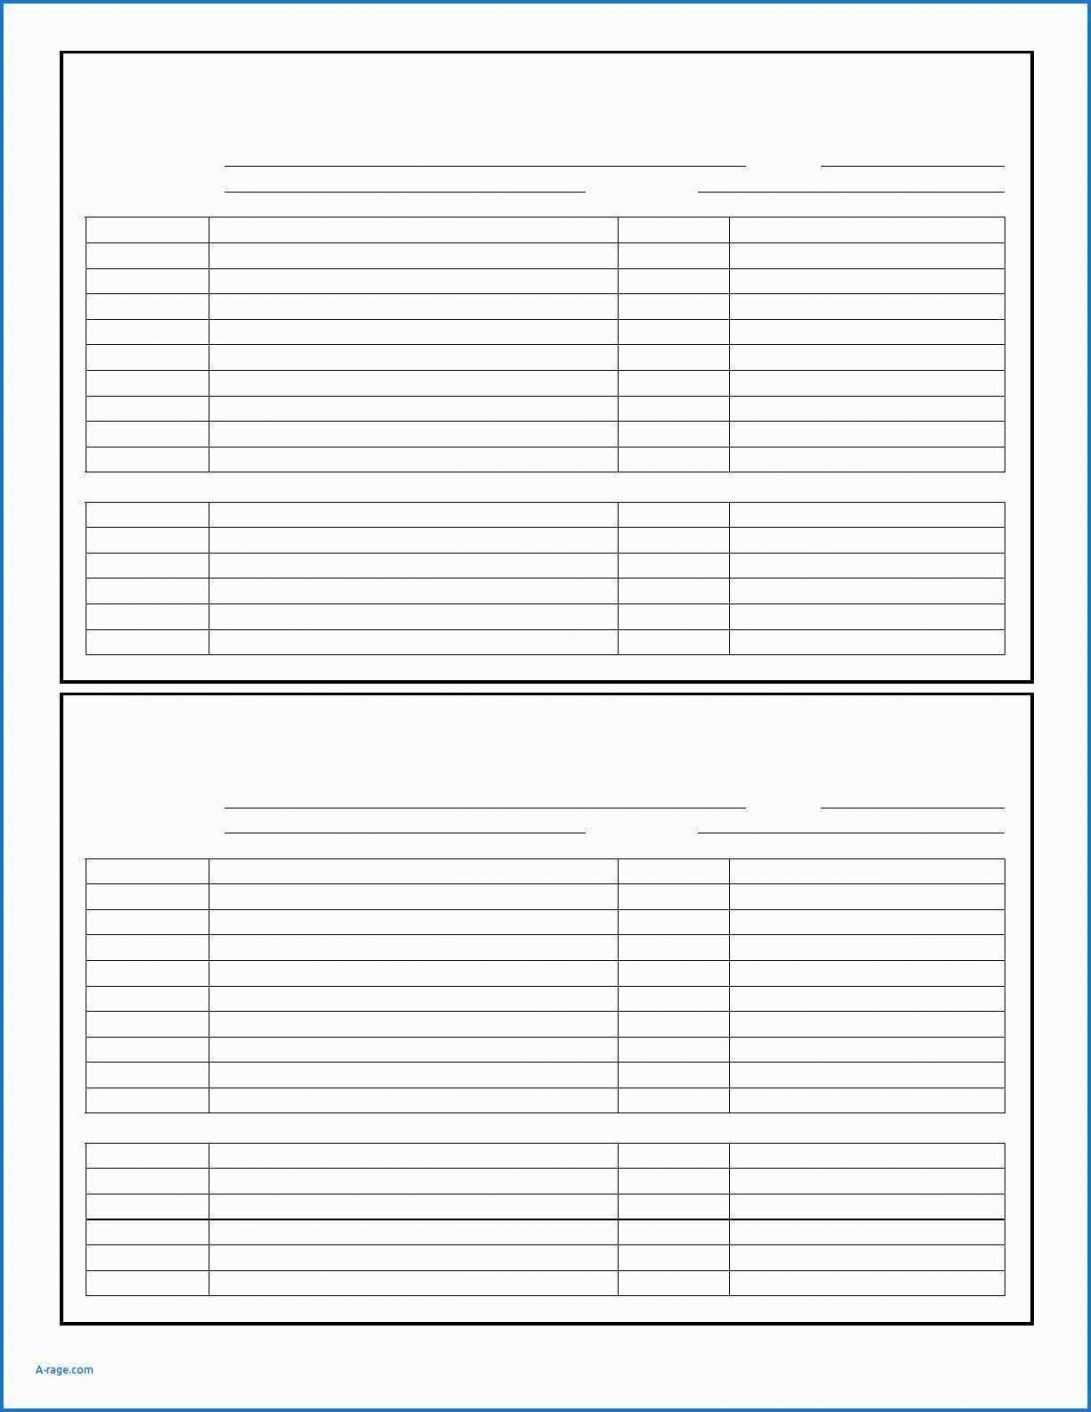 Batting Order Template Pdf Excel Lineup Baseball Card intended for Baseball Card Size Template